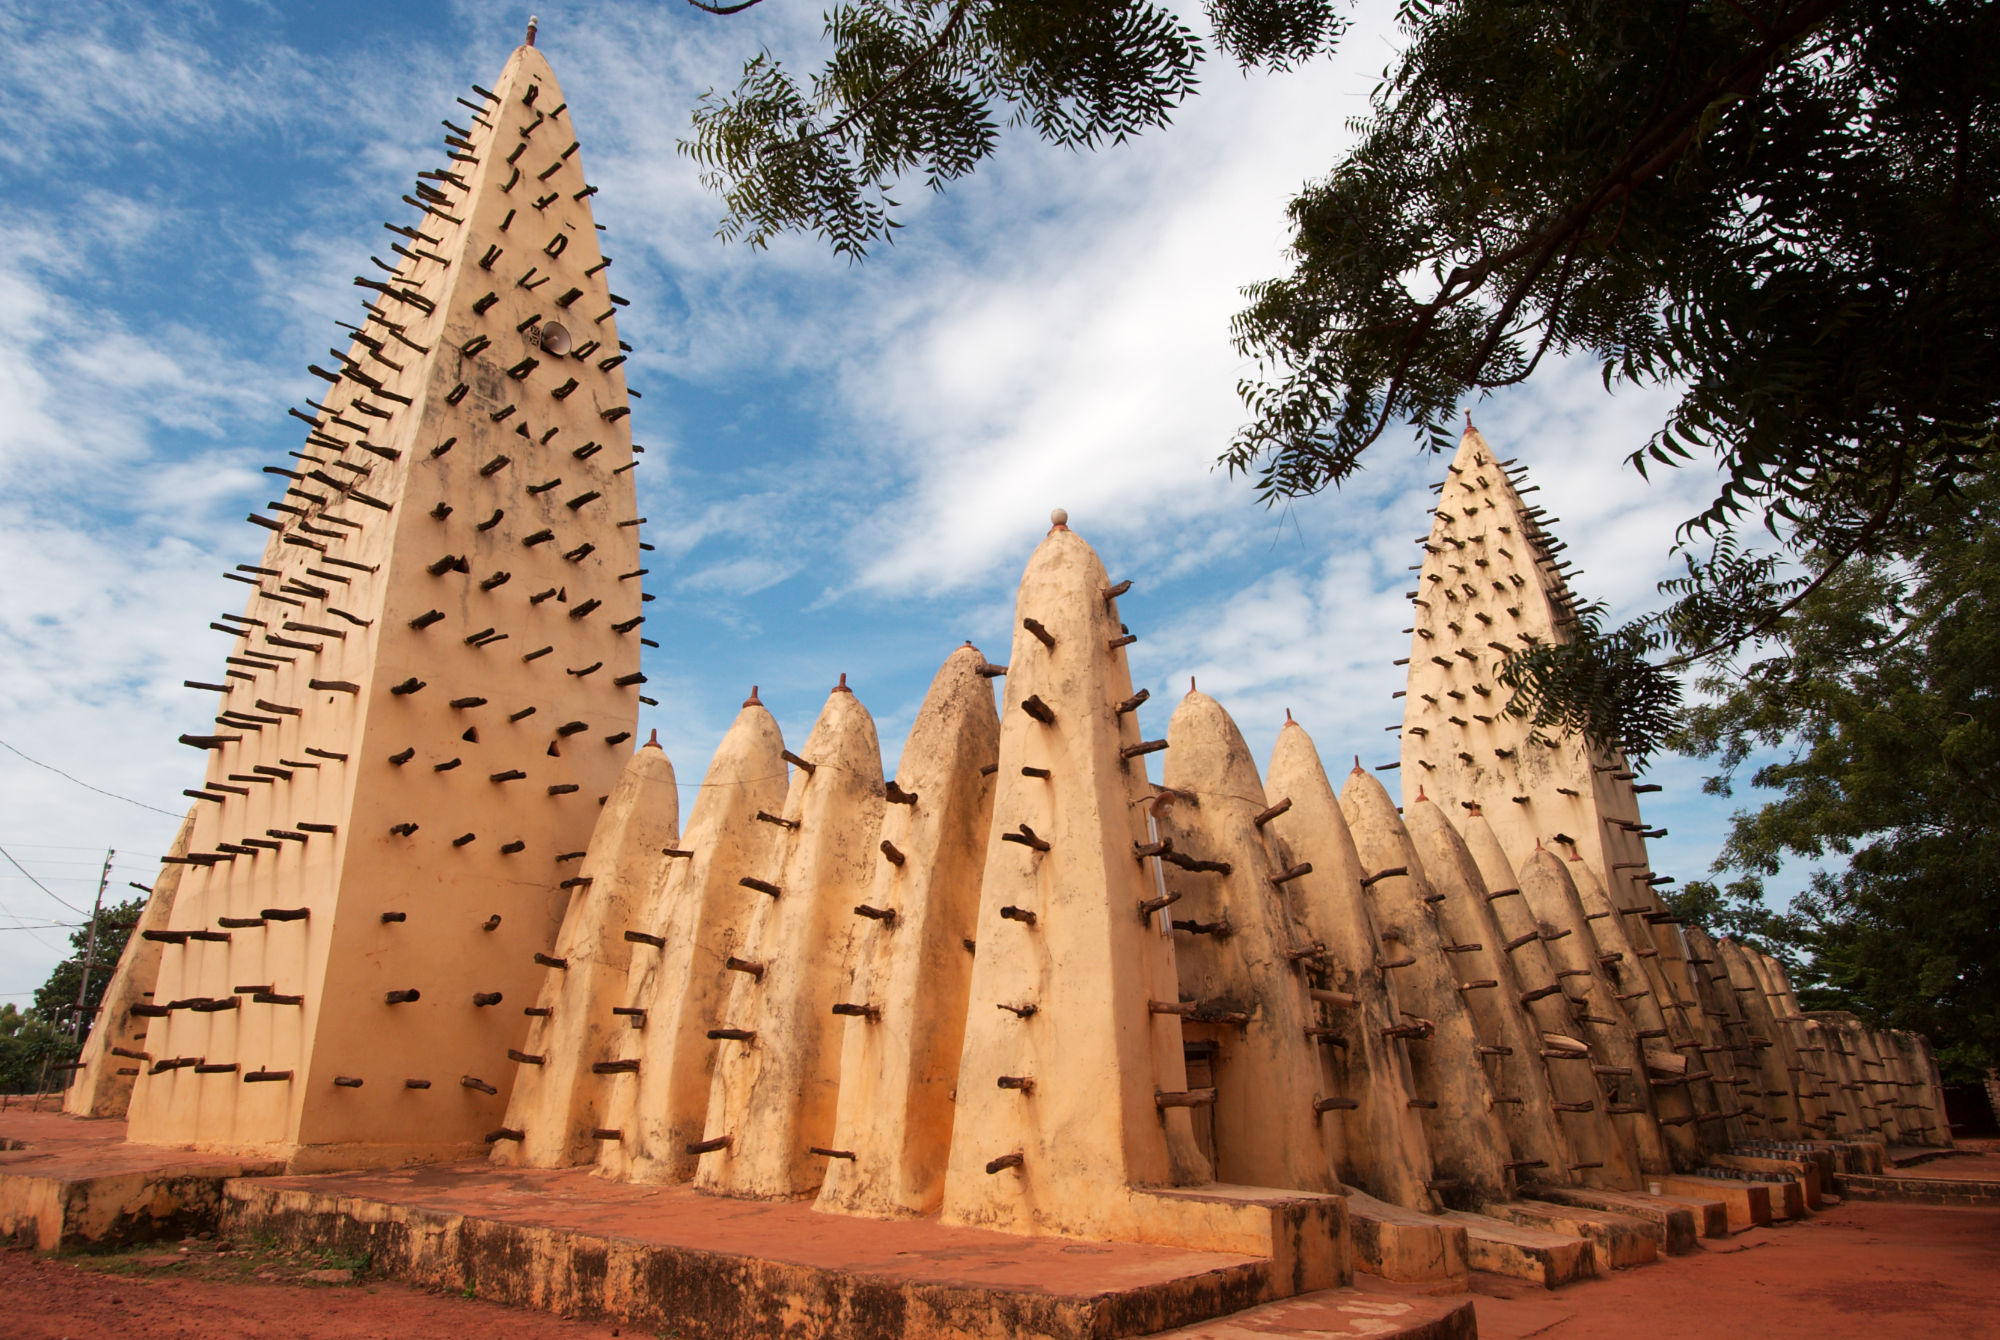 Moschea di Bobo Dioulasso